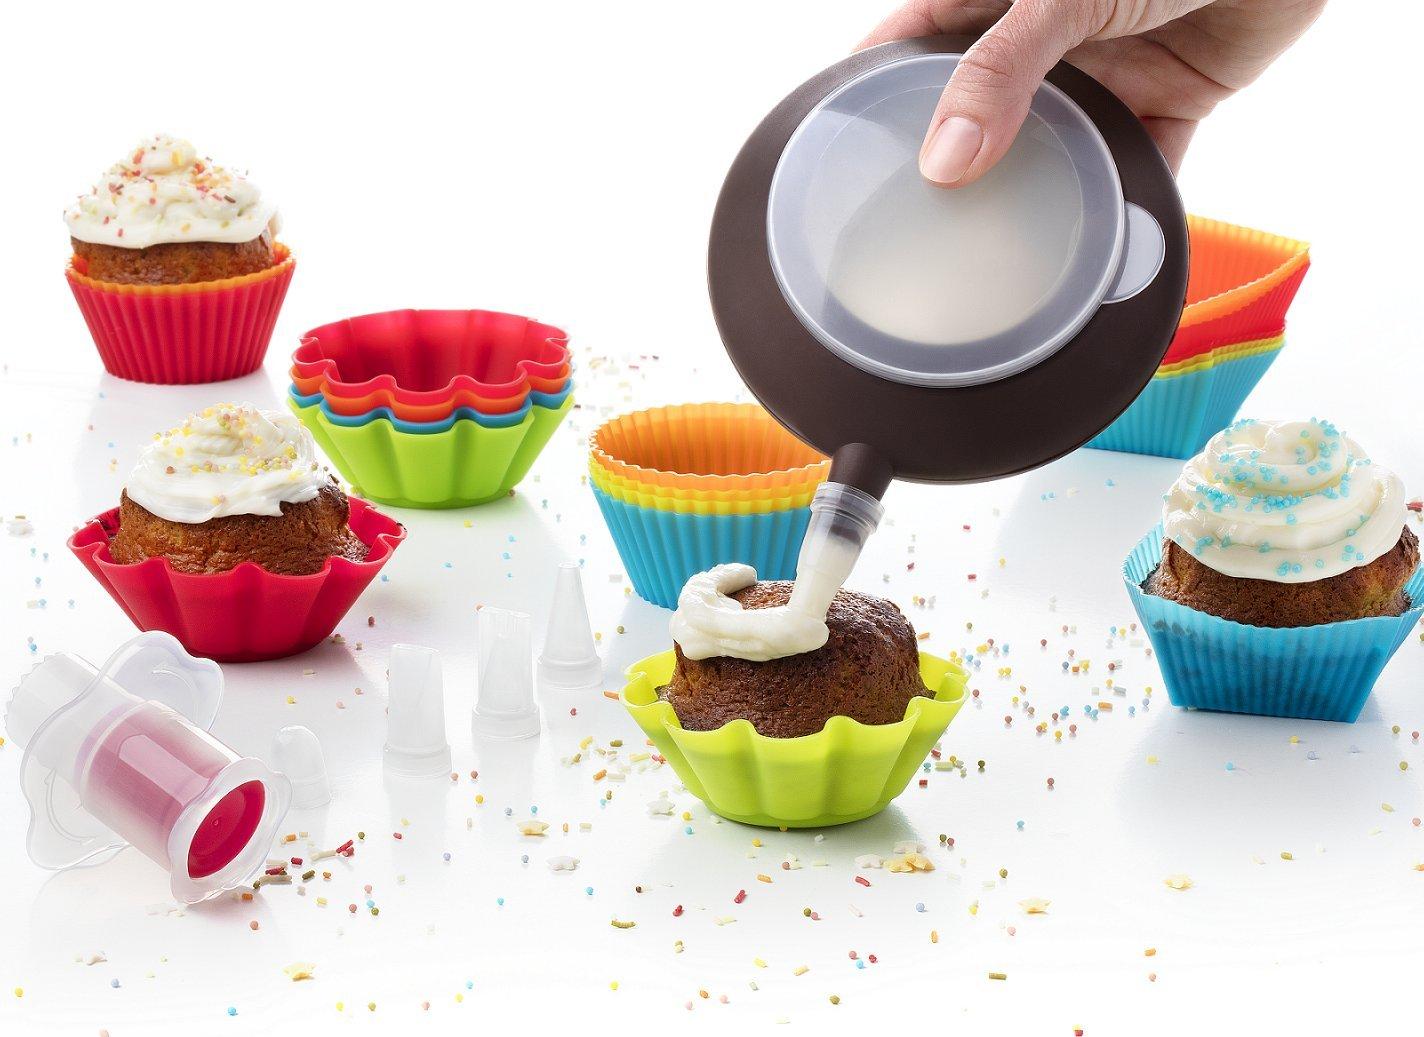 Amazon.com: Kid Baking Set 24 Baking Muffin Molds Silicone Cupcake ...